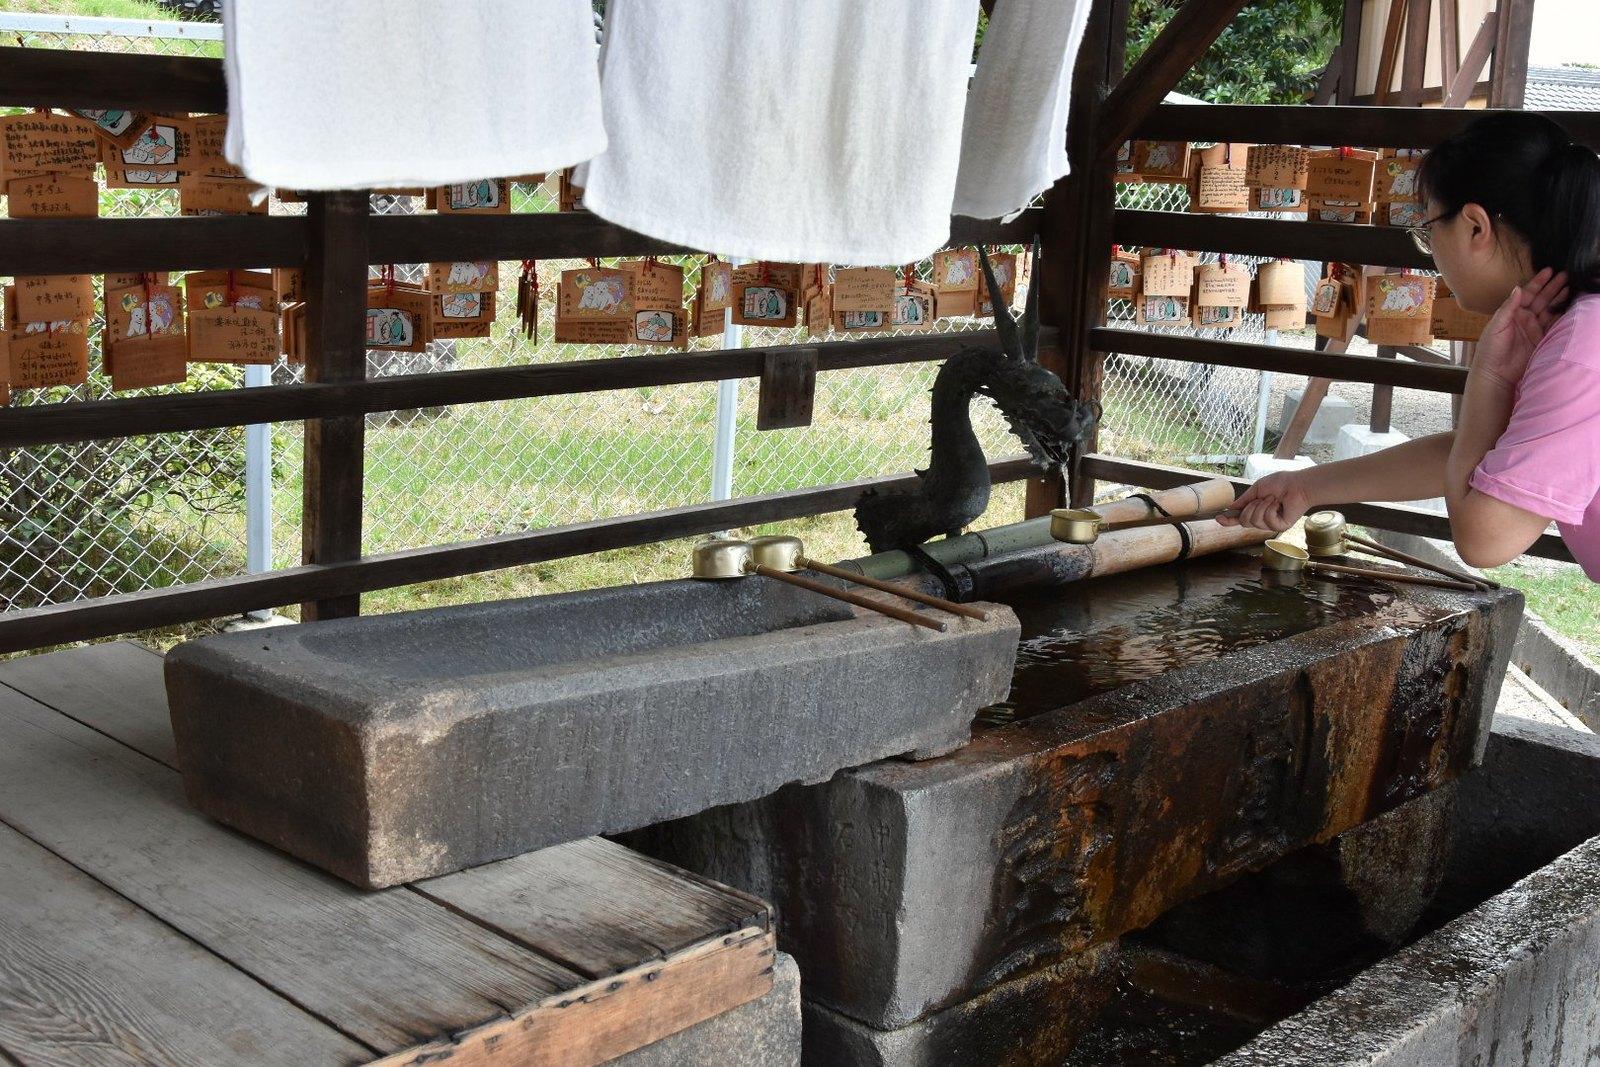 Nara - bassin à ablutions rituelles, Temple de Kofuku-ji